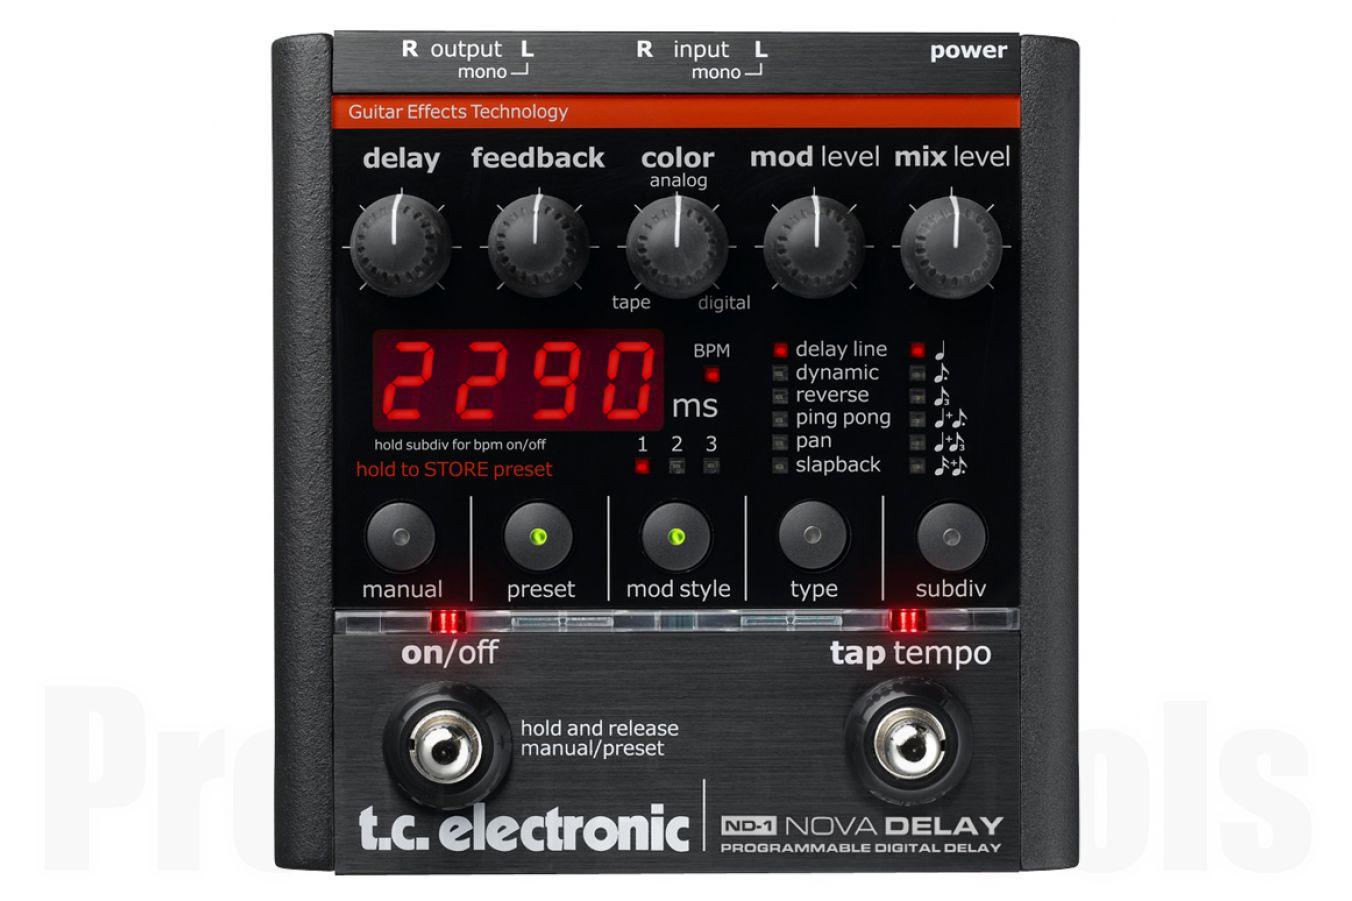 TC Electronic ND-1 Nova Delay - demo